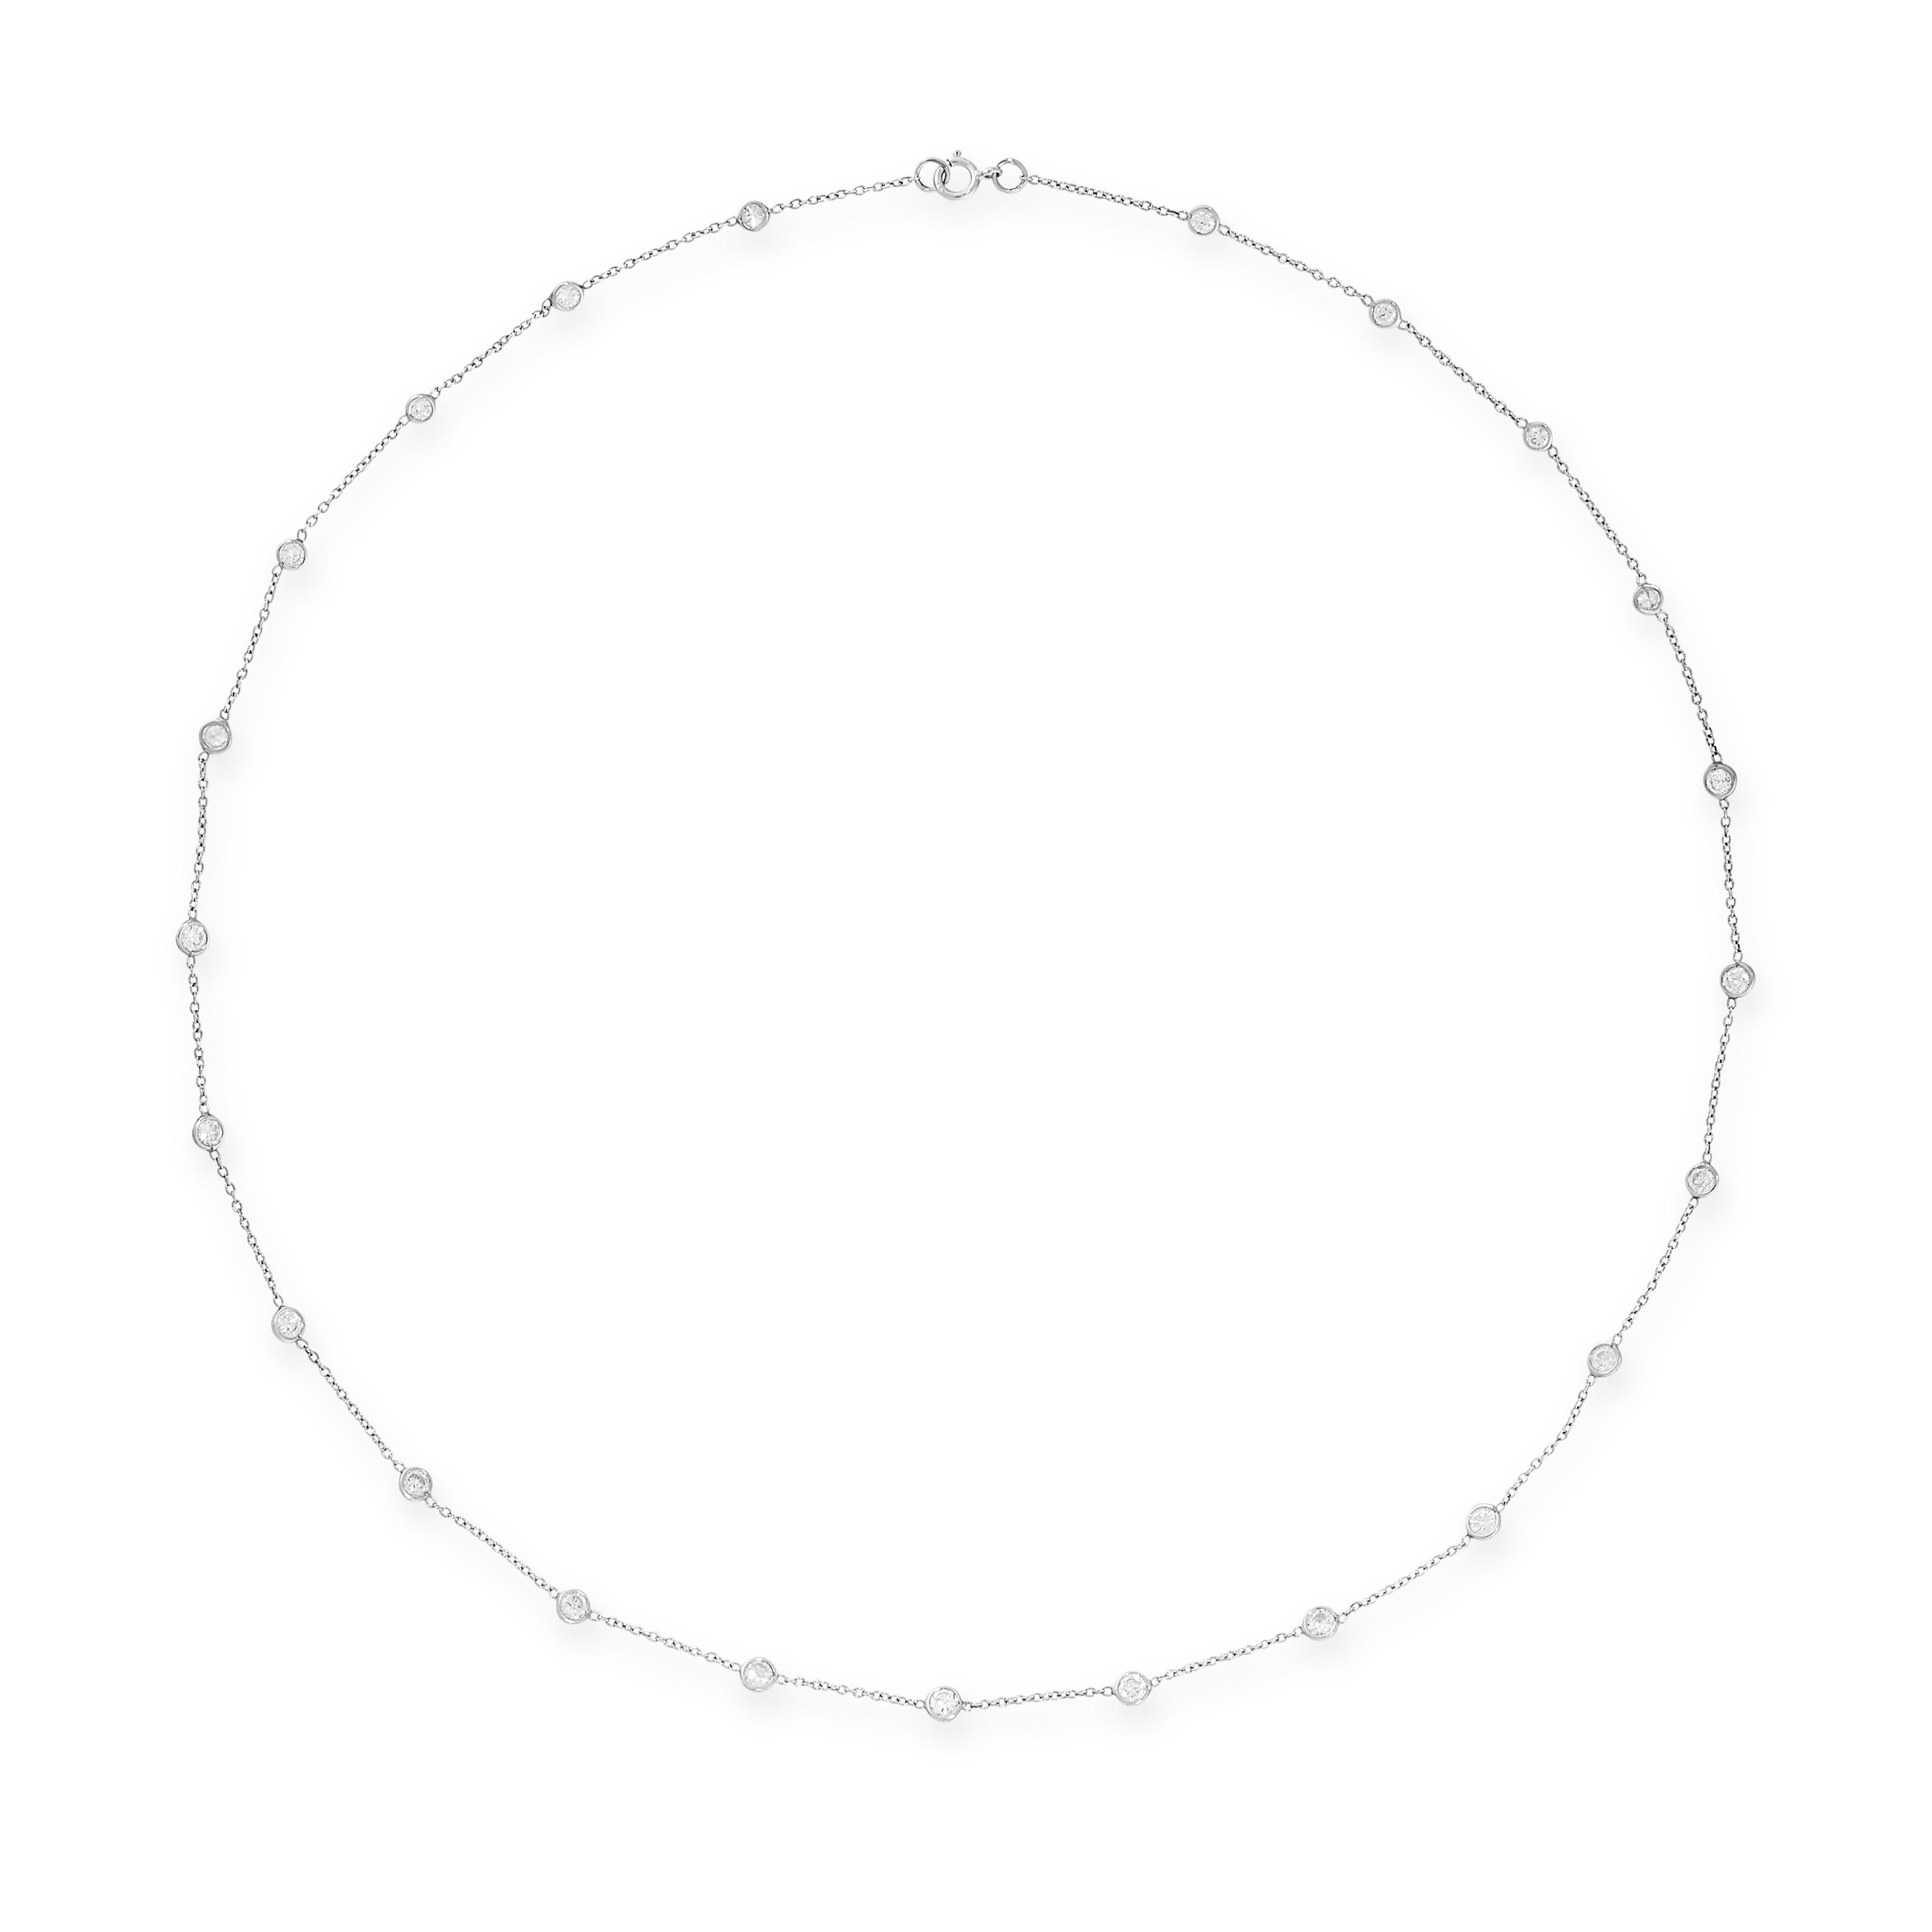 A DIAMOND NECKLACE the belcher link chain punctuated by twenty-three bezel set round cut diamonds,